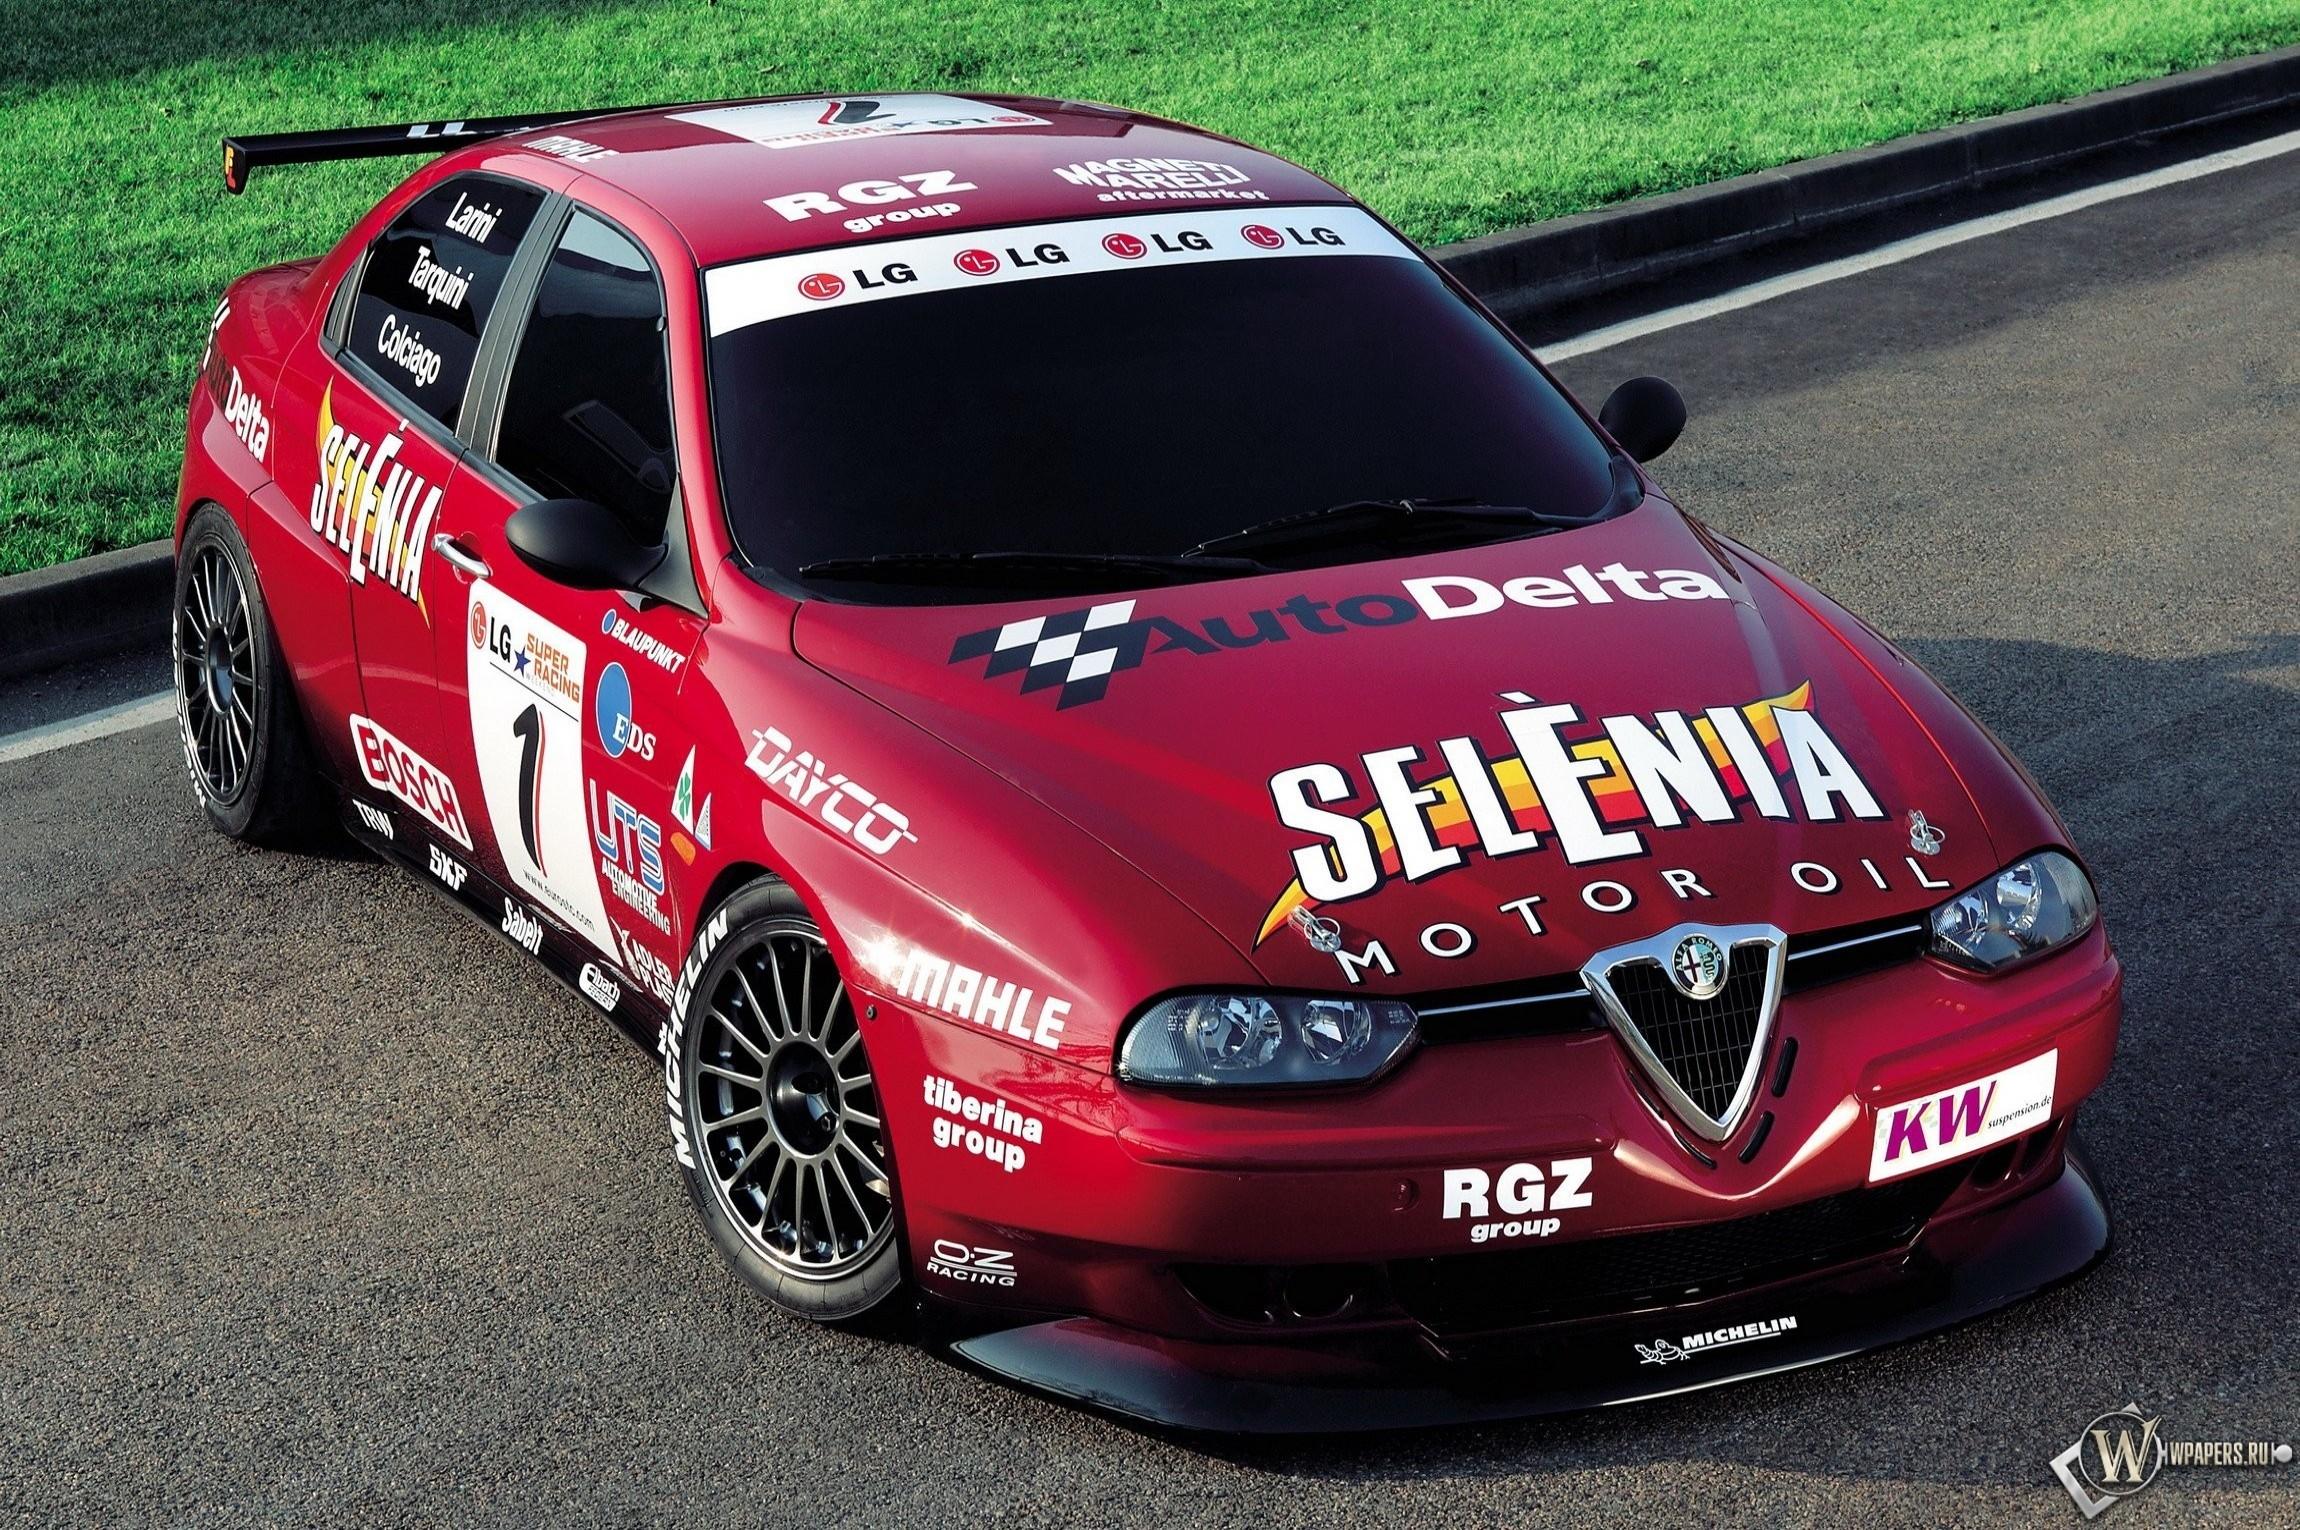 Спортивный седан Alfa Romeo 156 GTA FIA ETCC — карточка